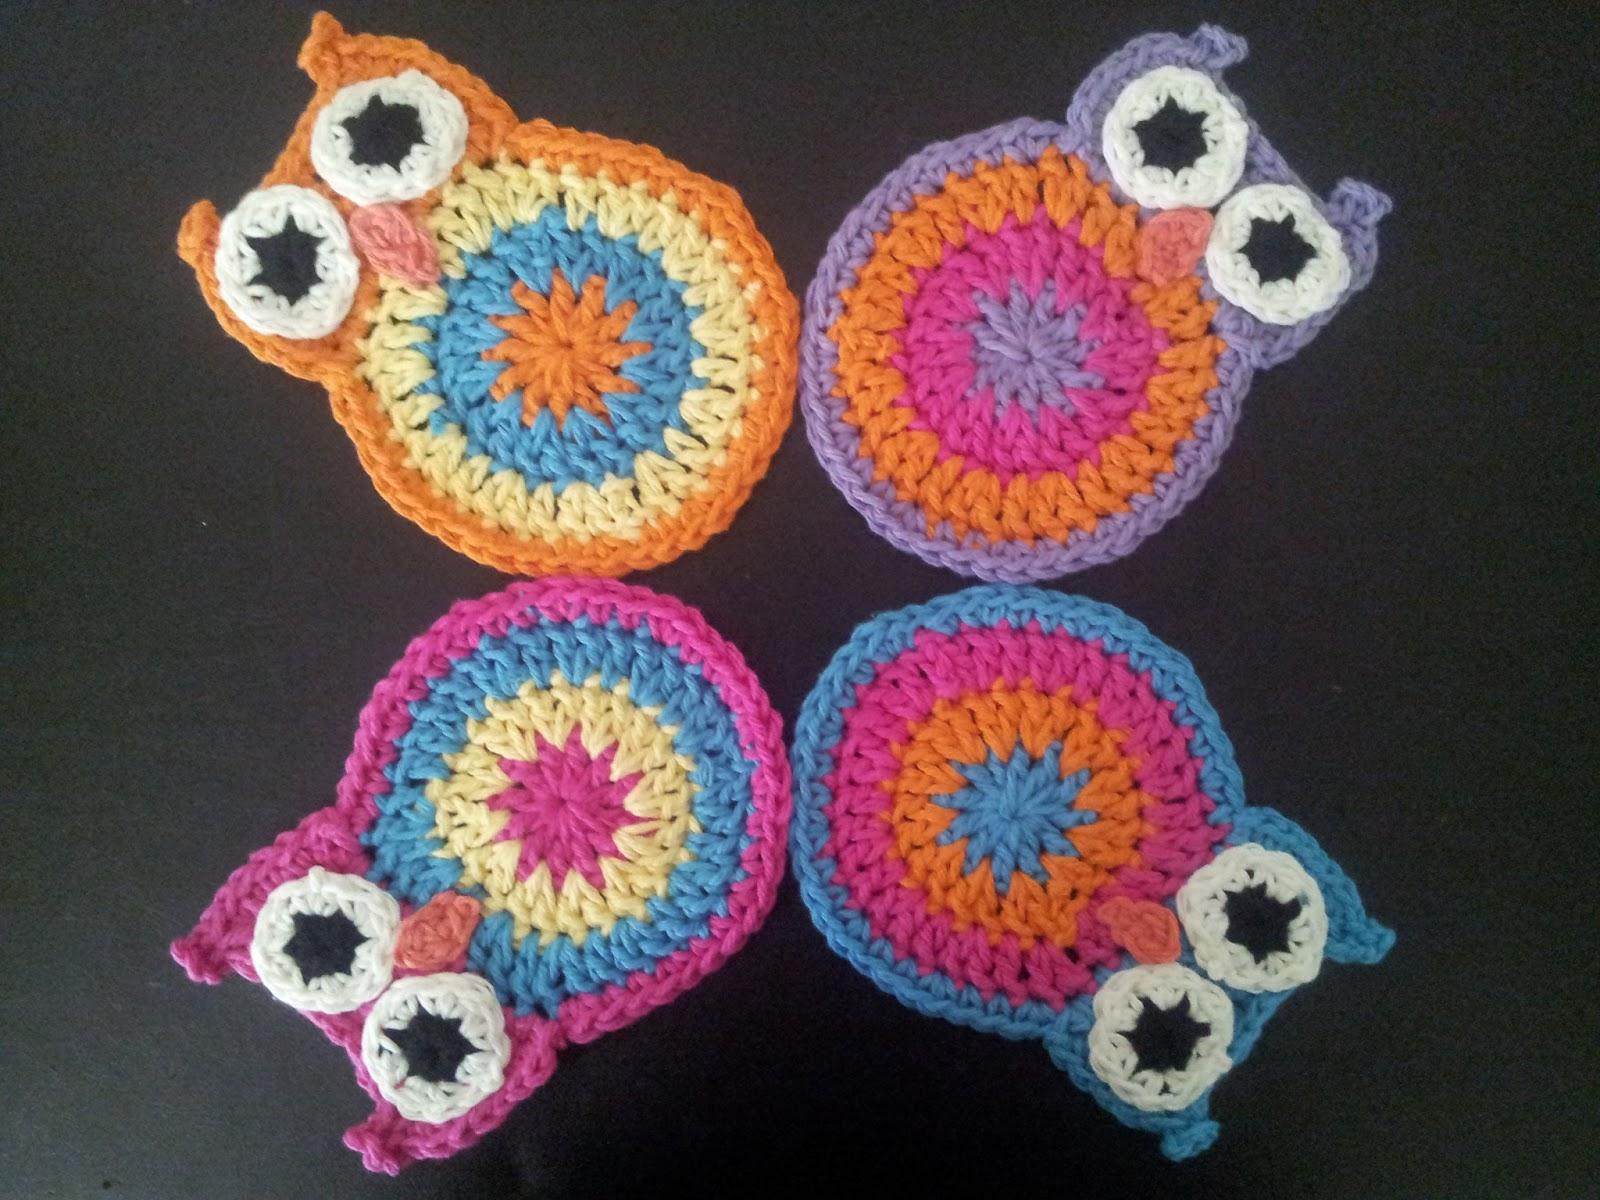 ChirpinBirdie: Fun Flower Coaster